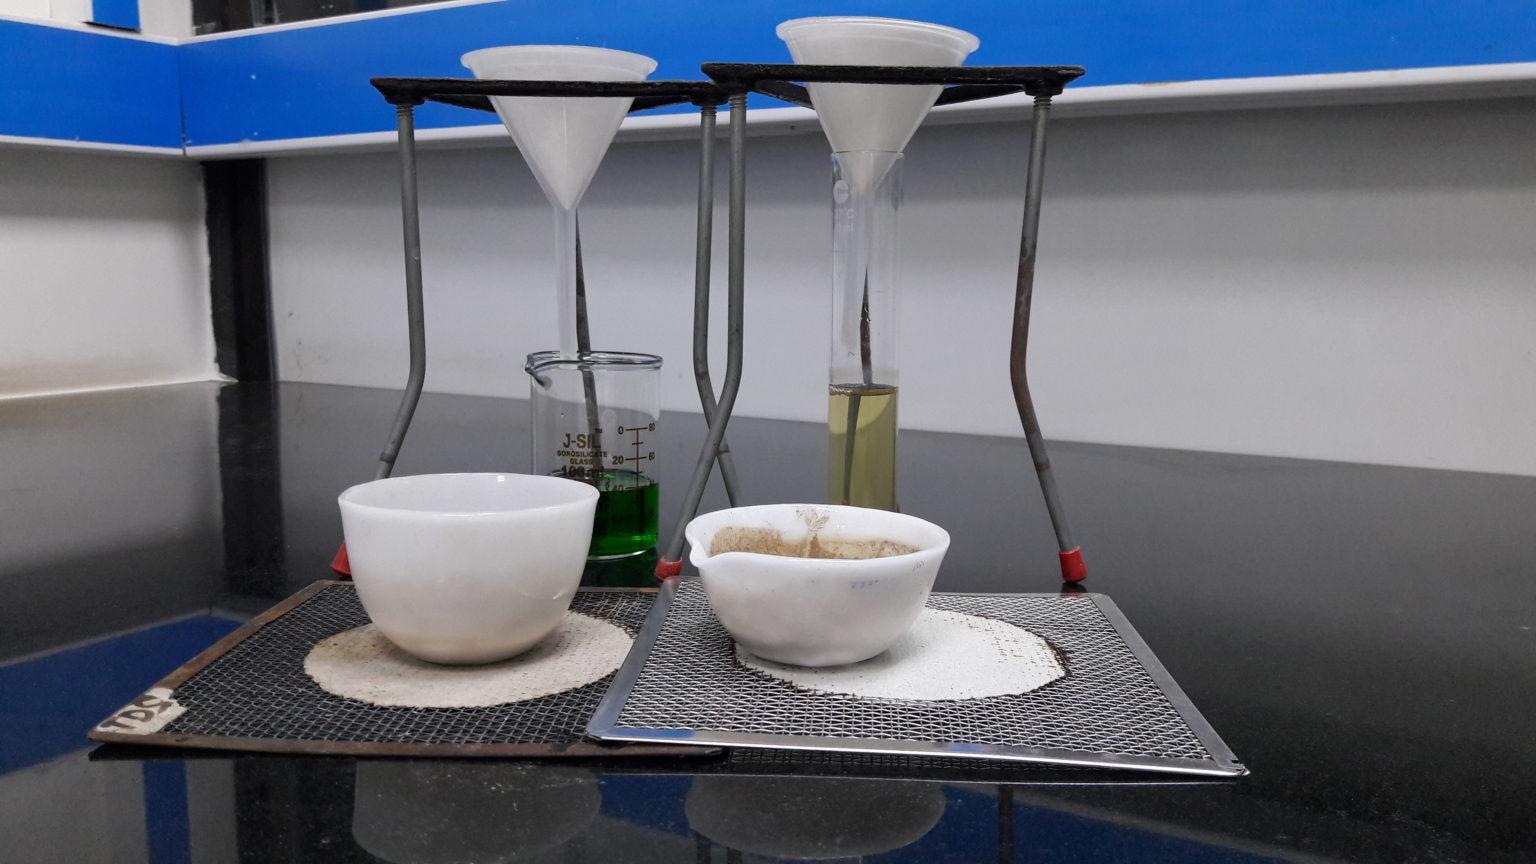 industrial wastewater testing